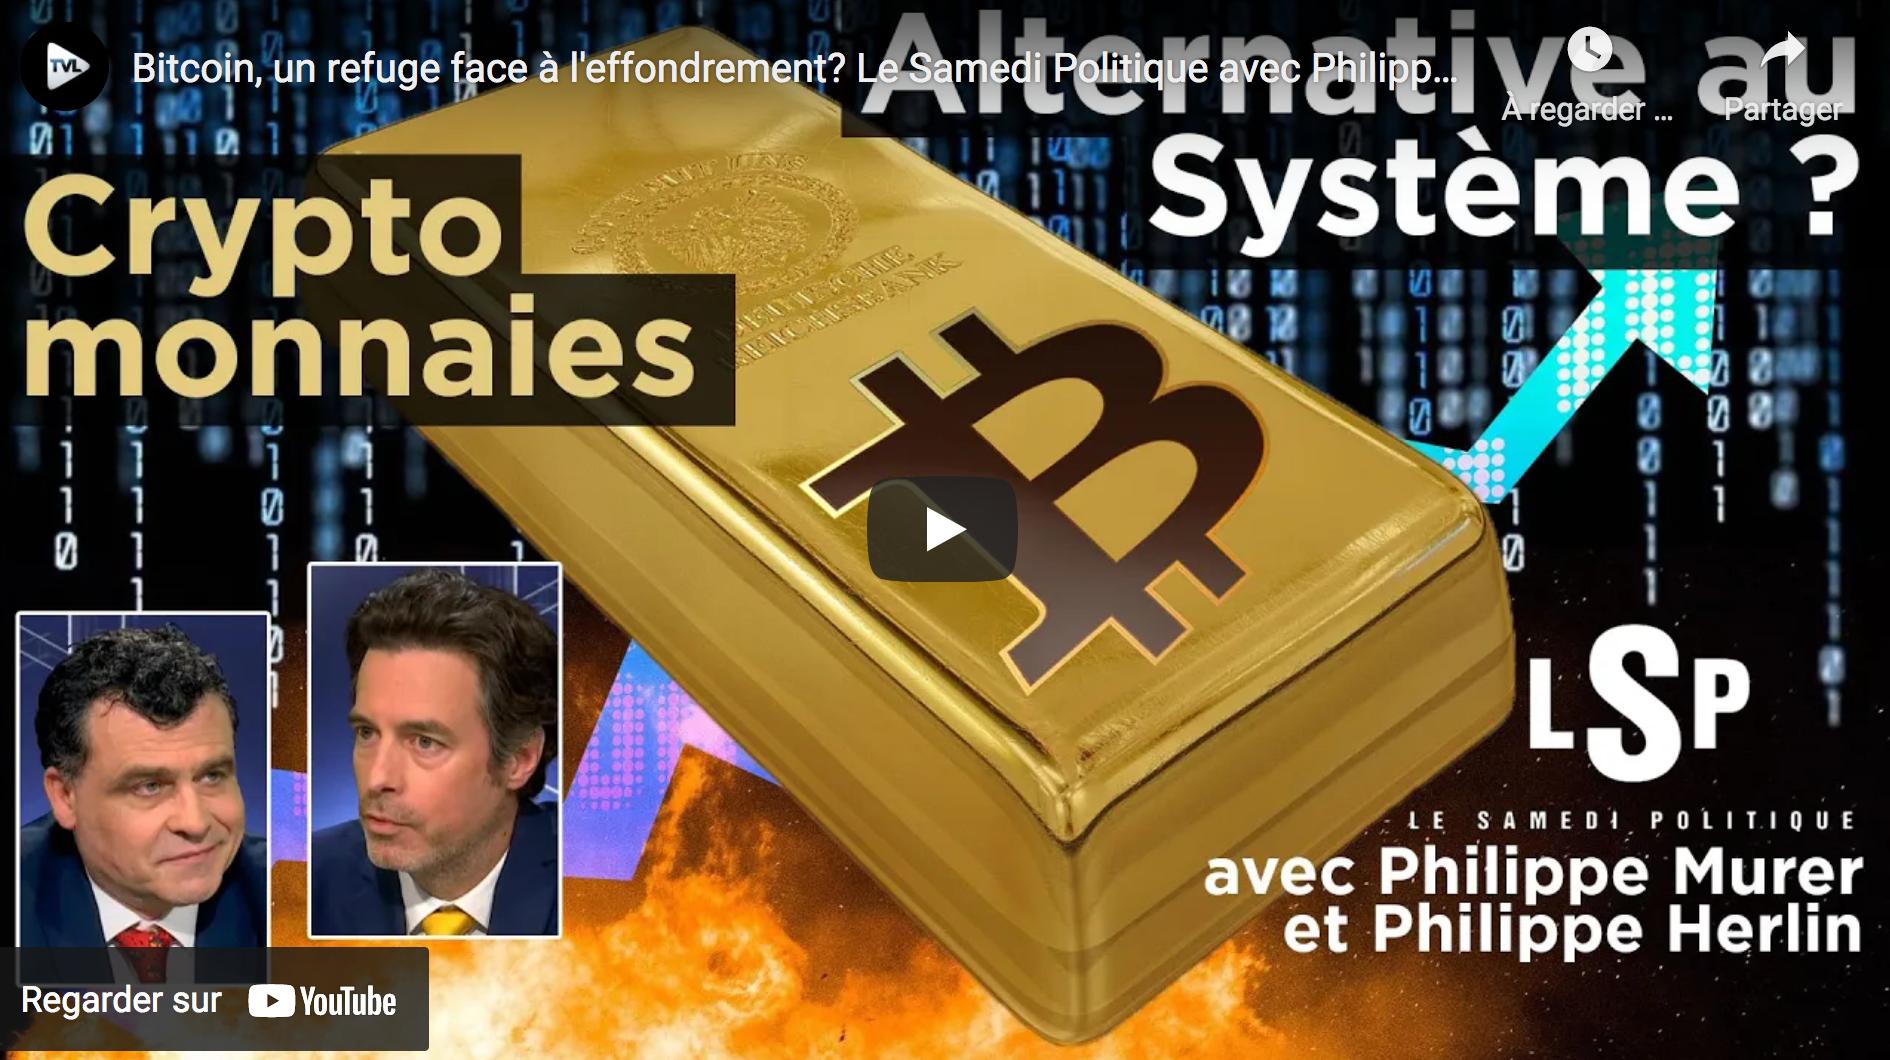 Bitcoin, un refuge face à l'effondrement ? (Philippe Herlin et Philippe Murer)